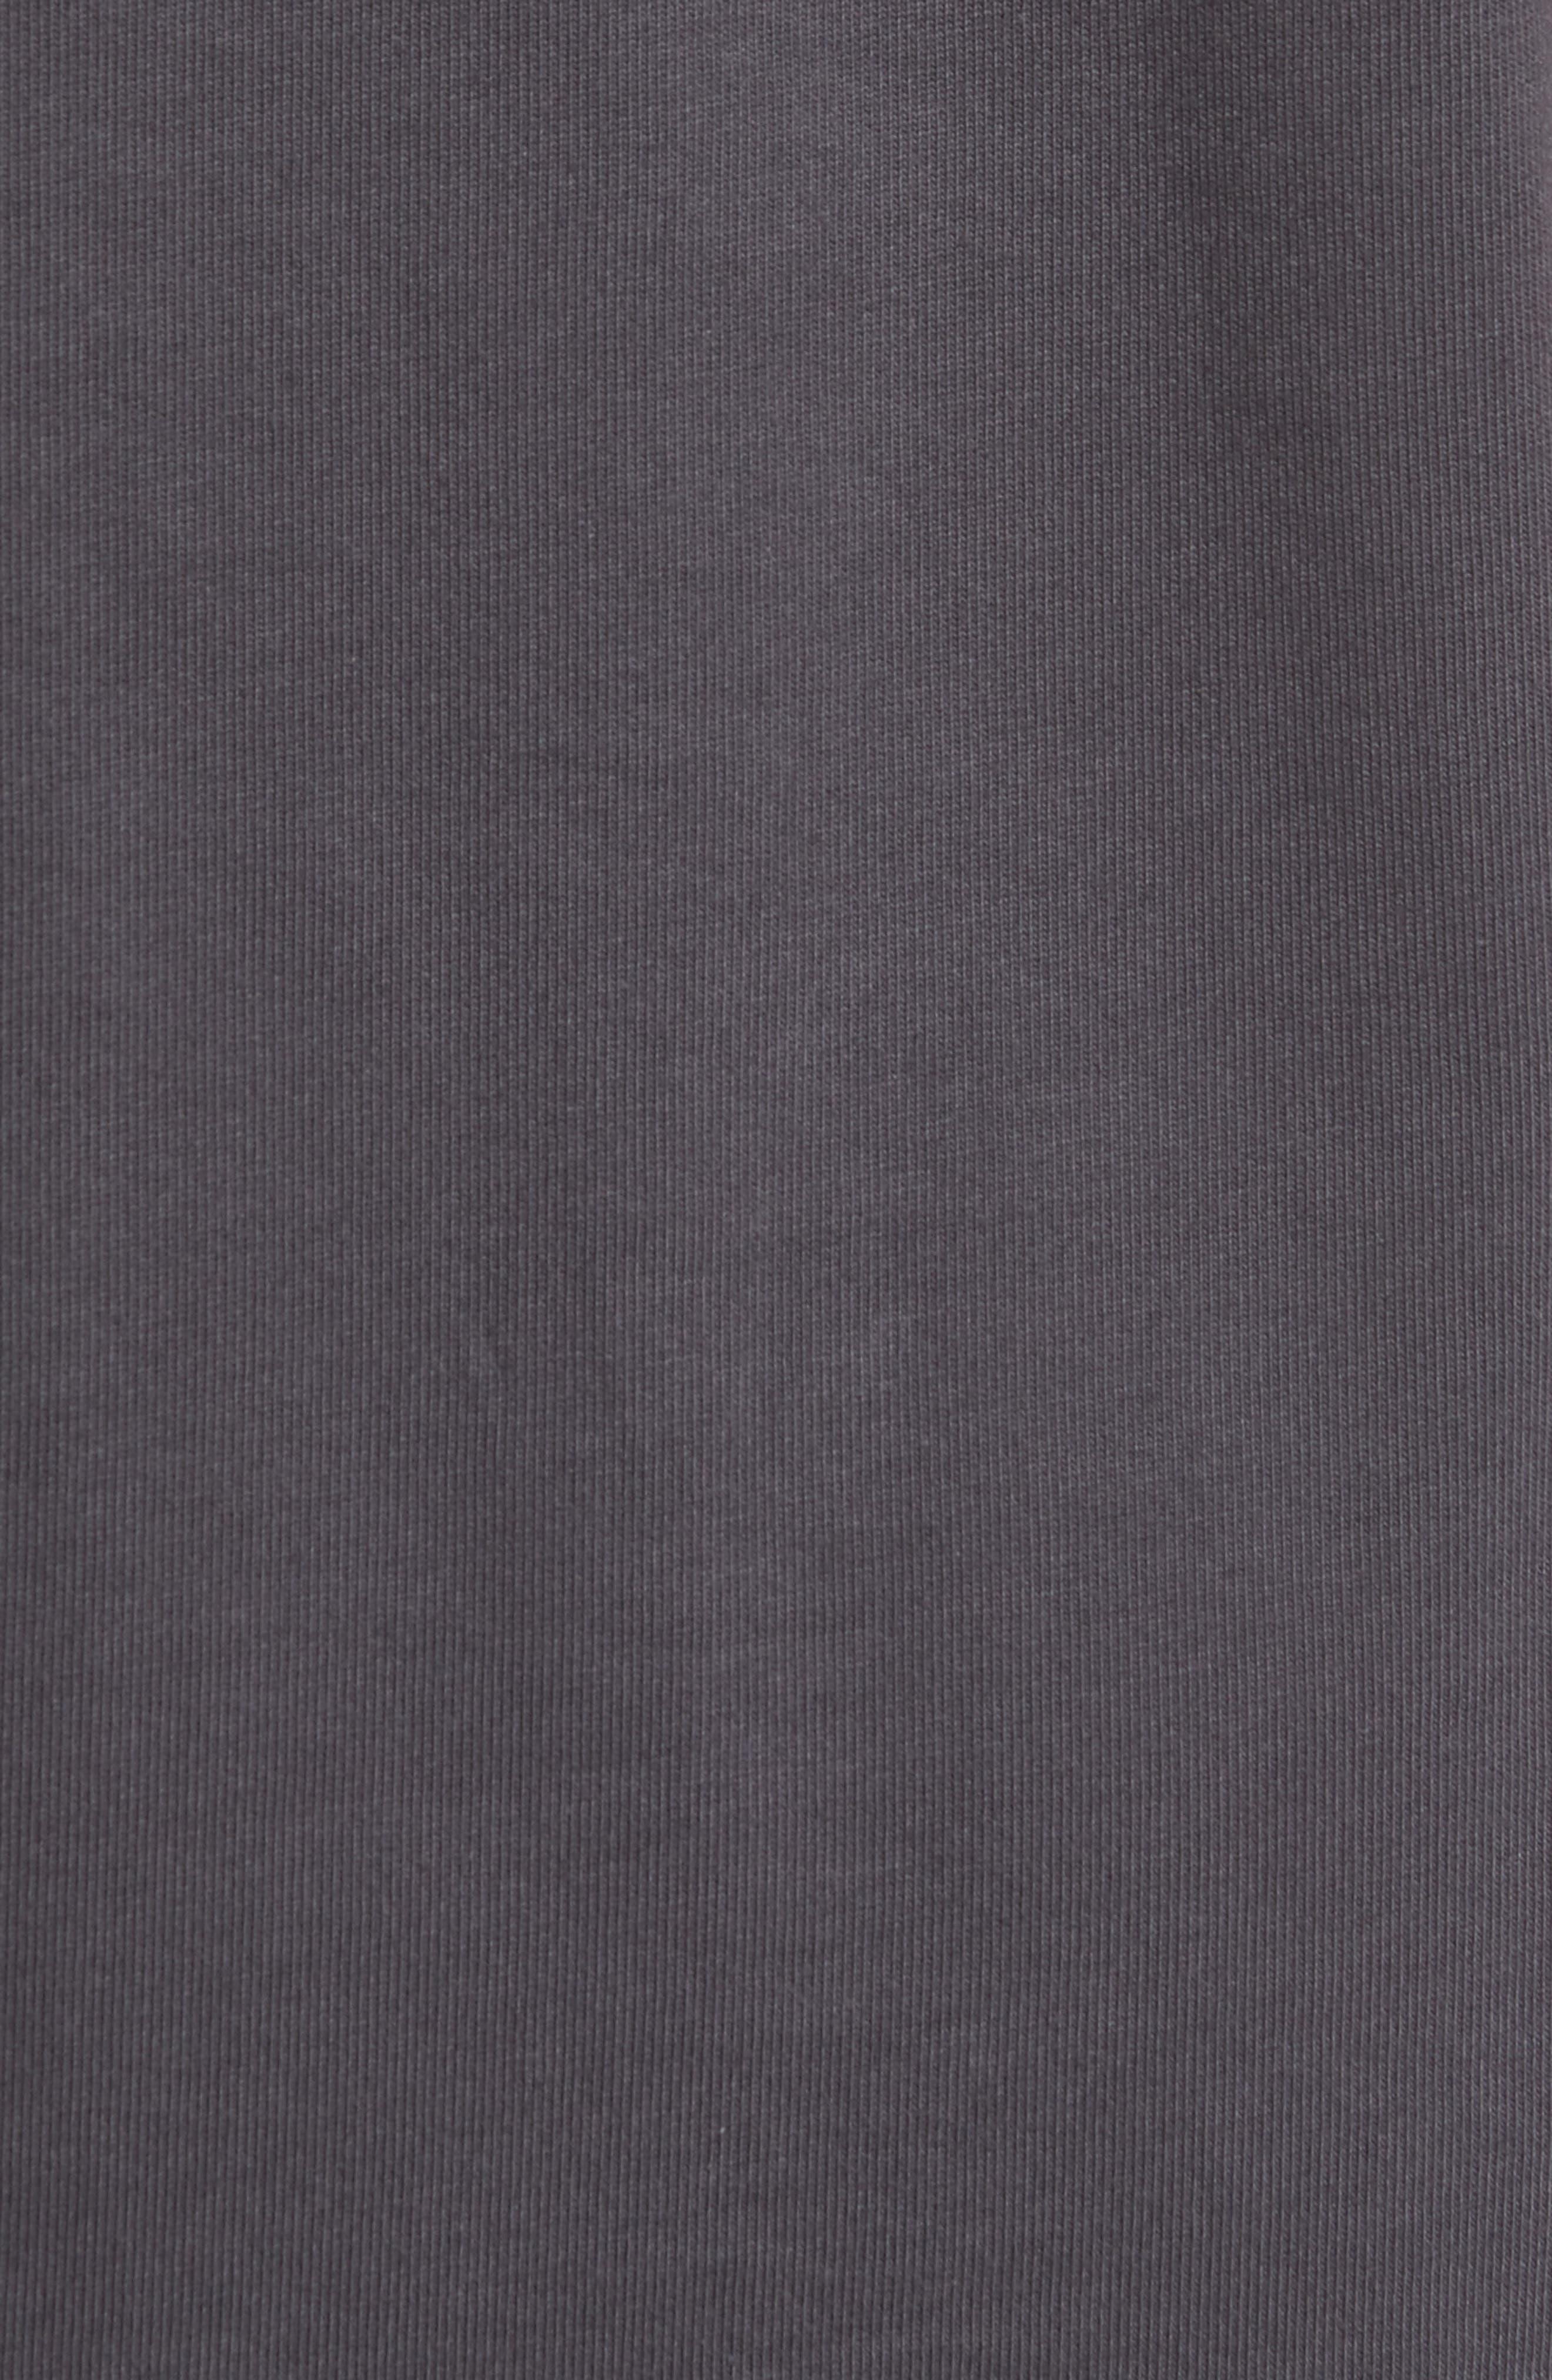 Sportswear 23 Engineered T-Shirt,                             Alternate thumbnail 5, color,                             Anthracite/ Black